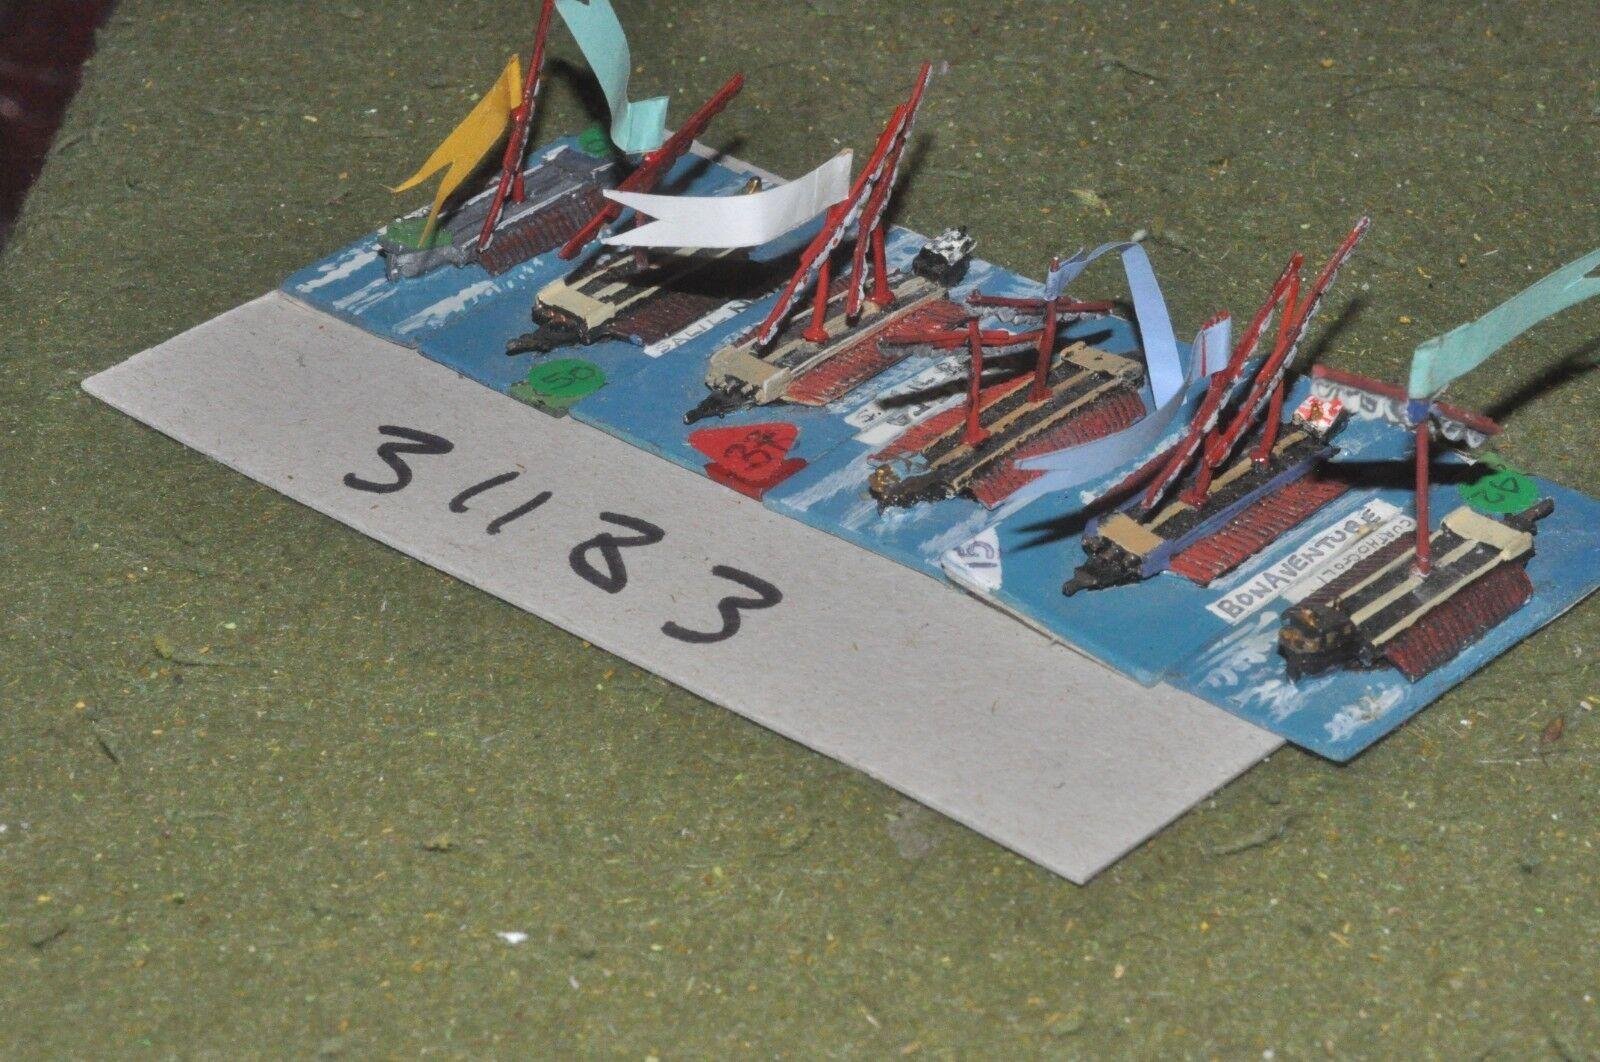 1 1200 renaissance   generic - galleys as photo - ships (31183)